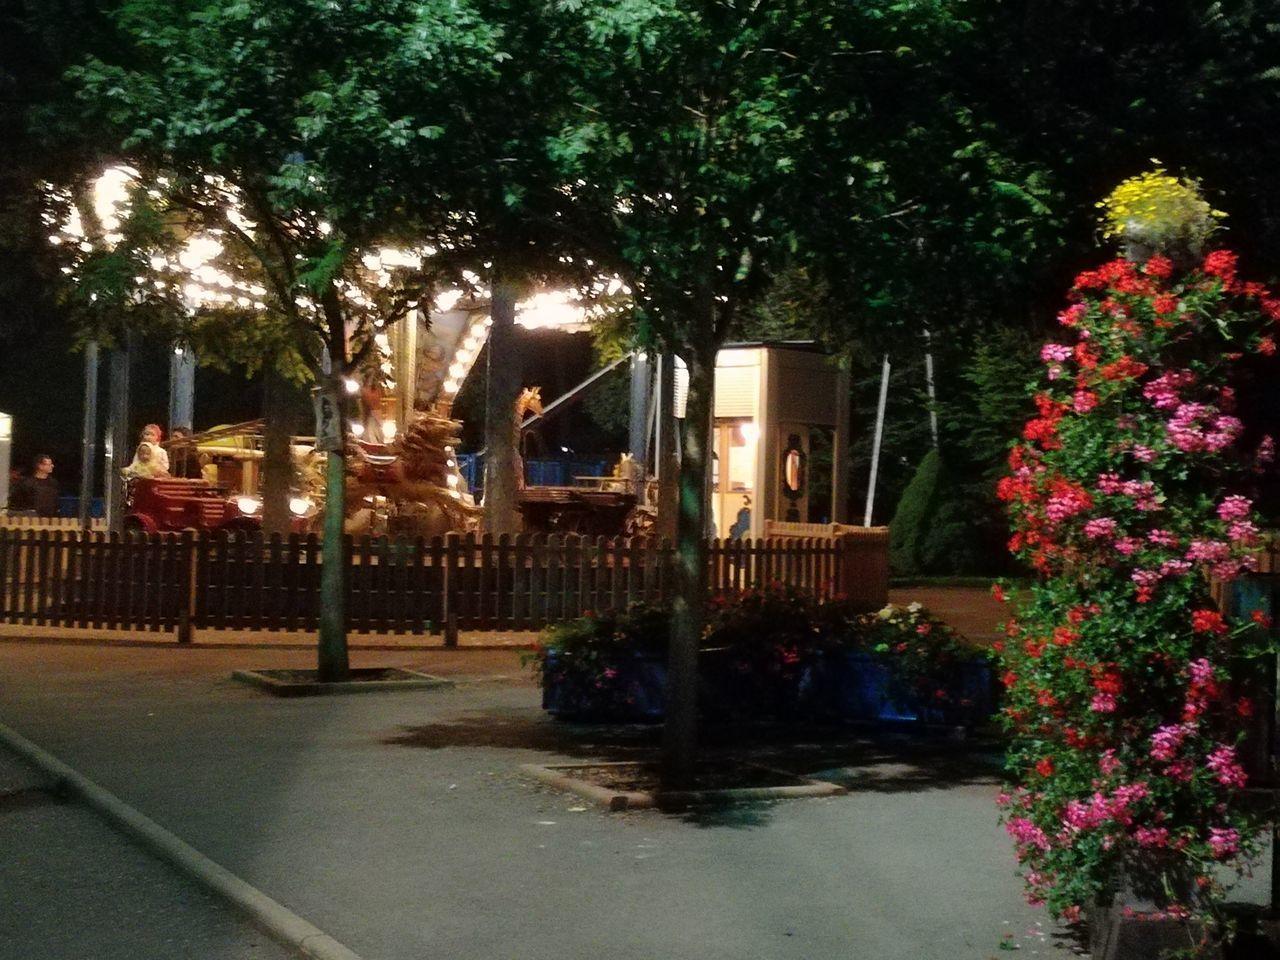 tree, night, illuminated, outdoors, growth, no people, flower, nature, architecture